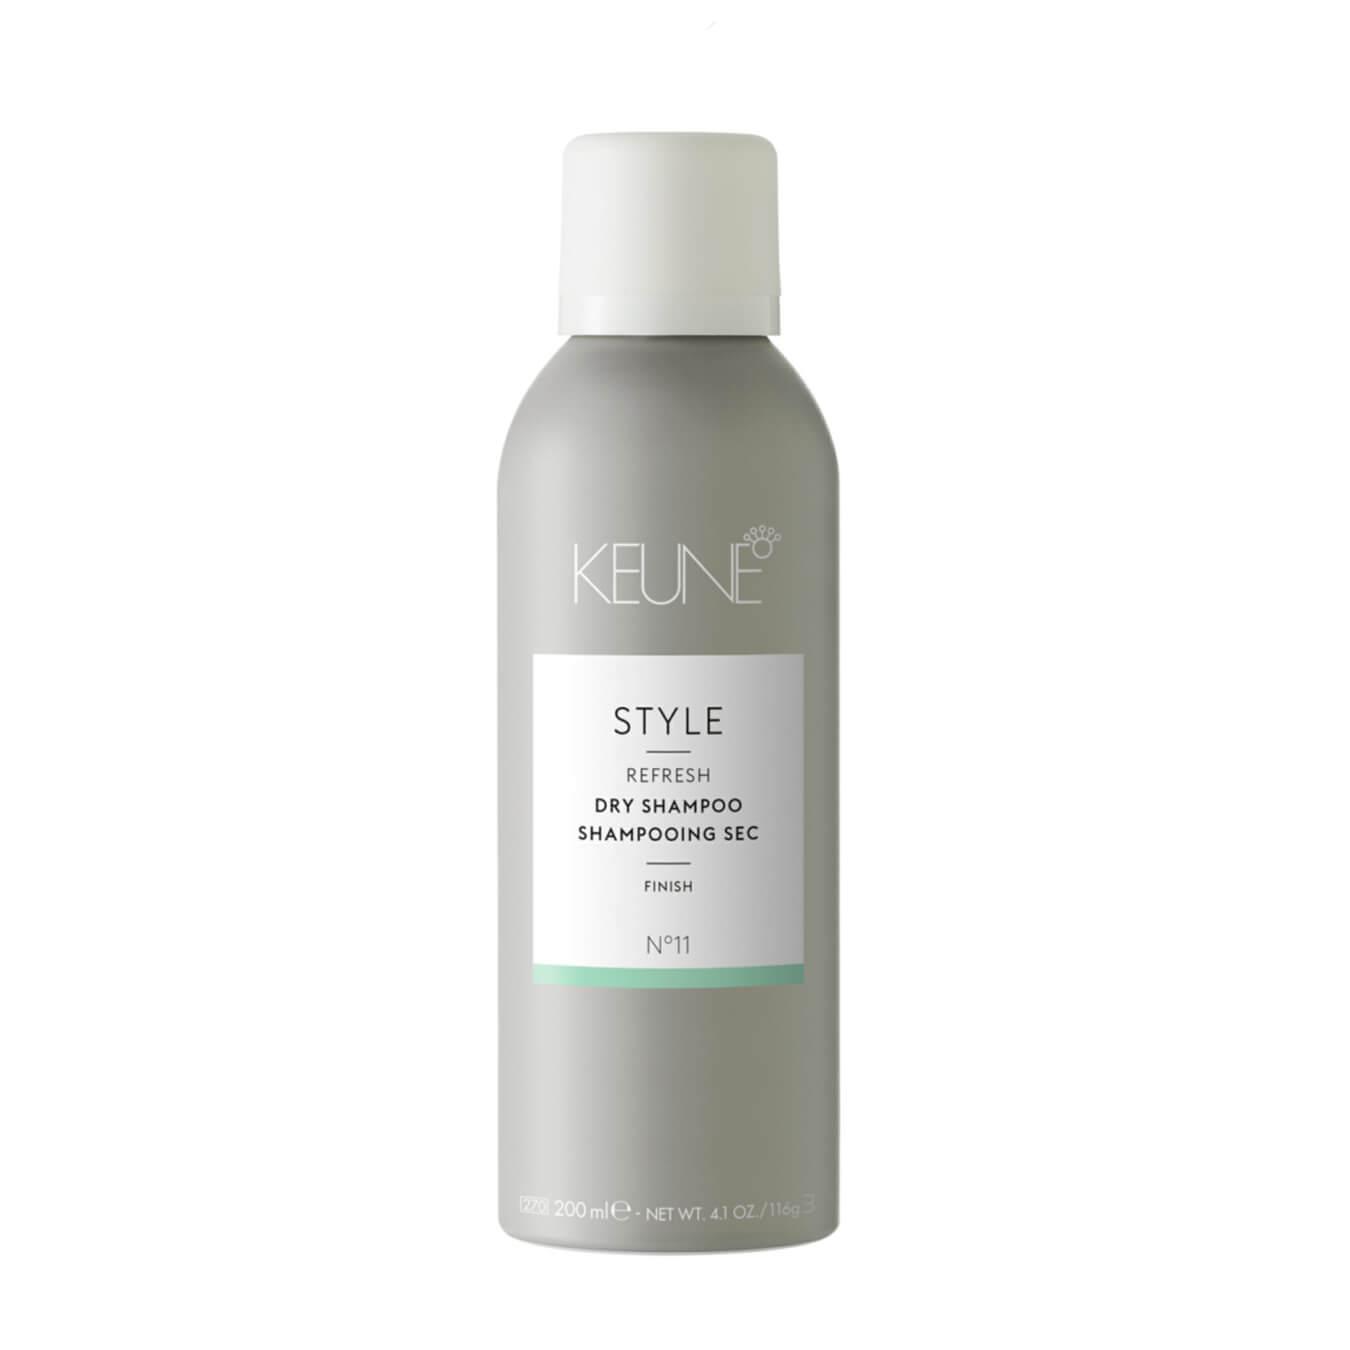 Koop Keune Style Dry Shampoo 200ml